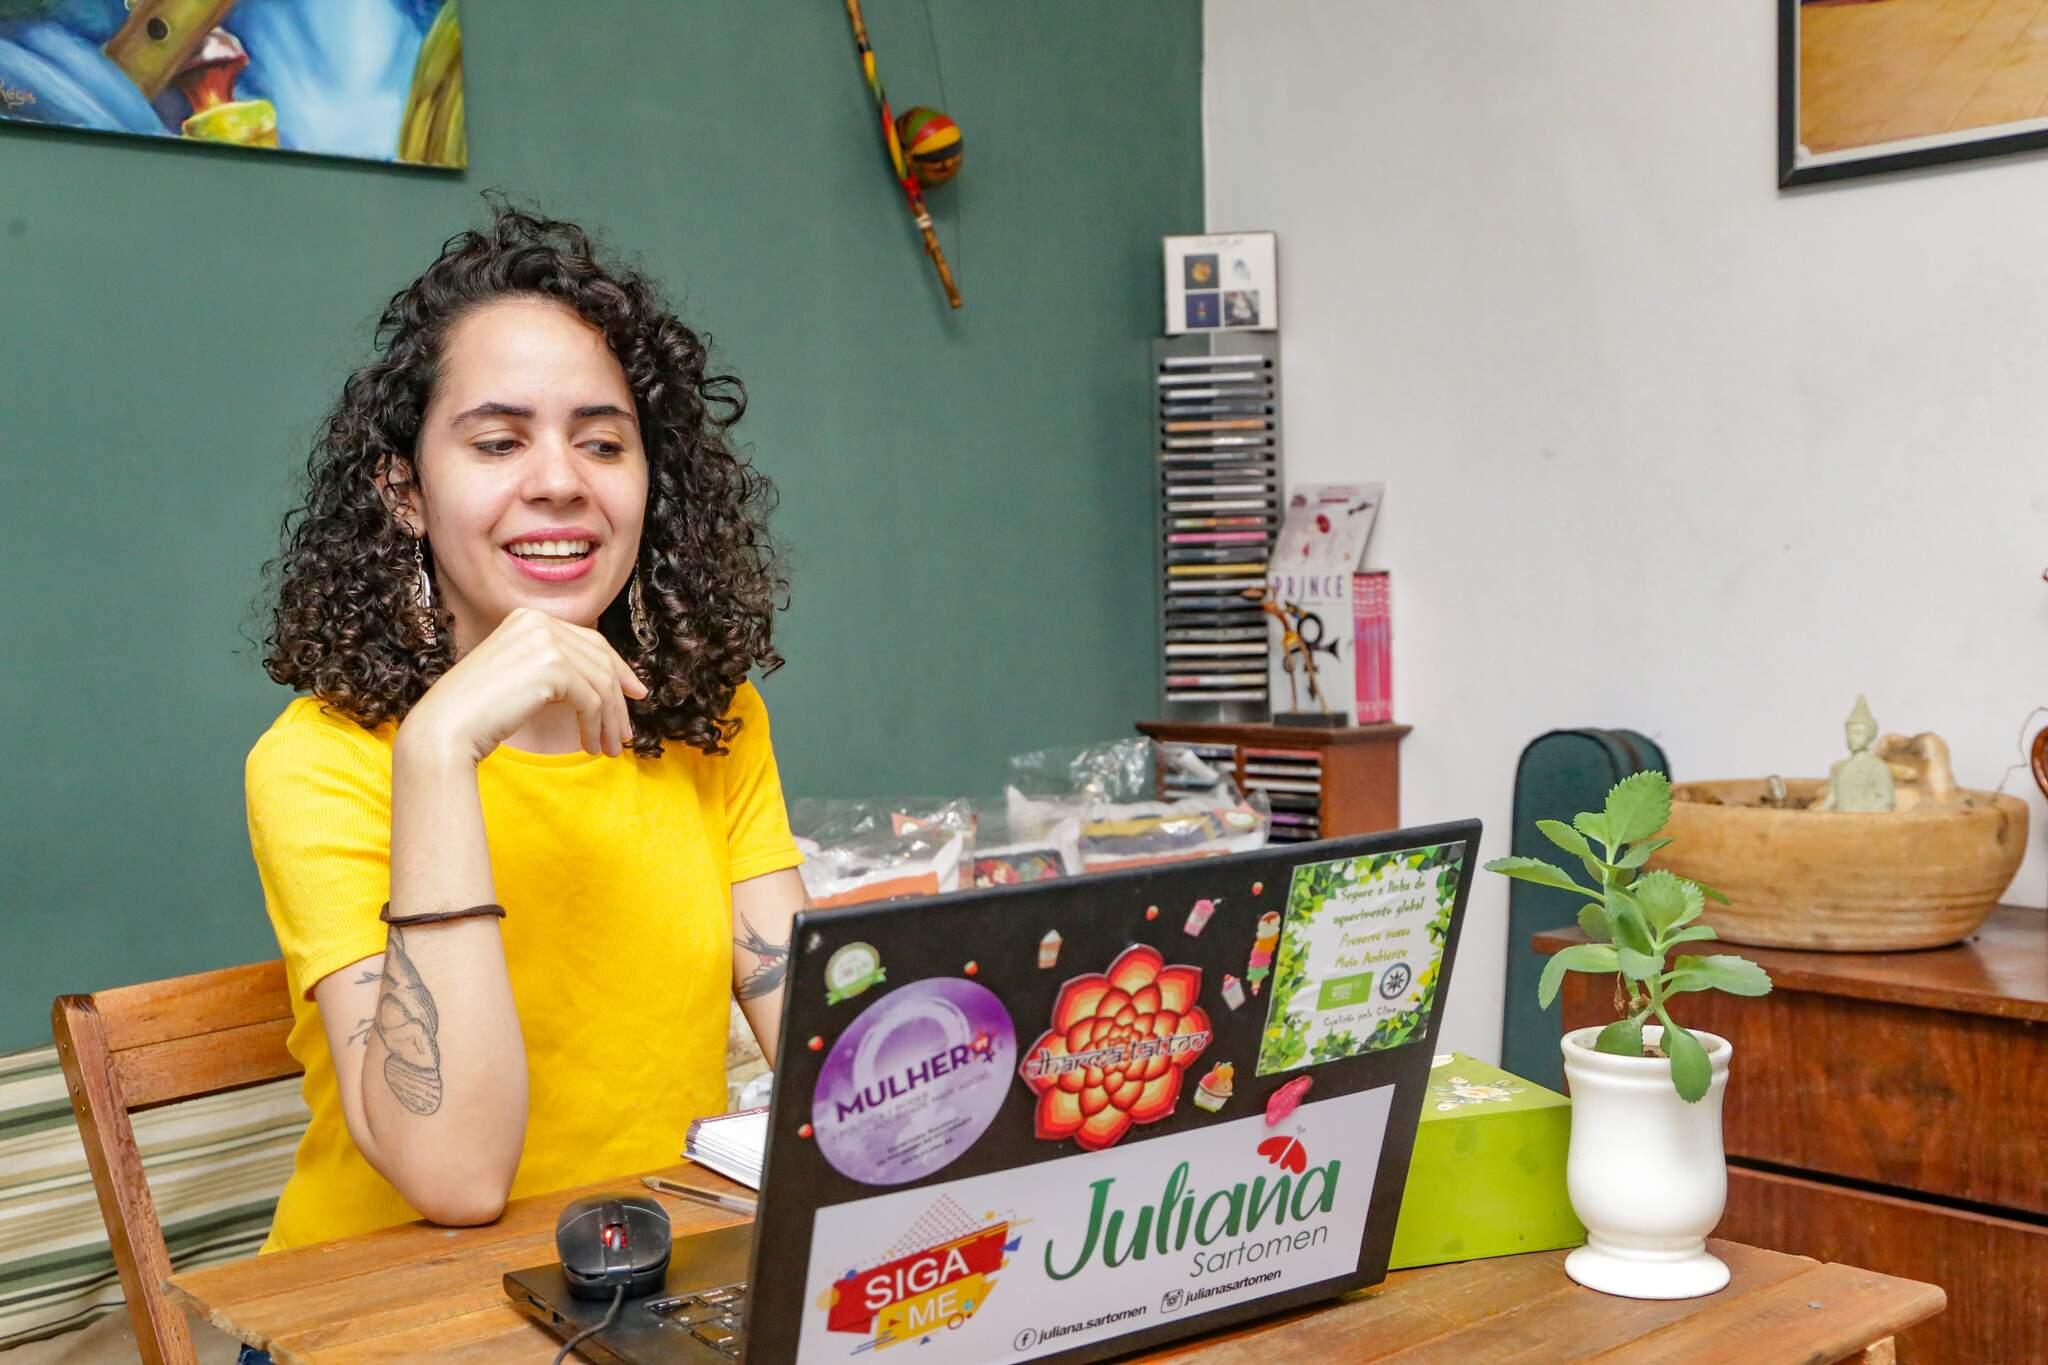 Juliana trabalha em casa mesmo antes da pandemia (Foto: Kisie Ainoã)